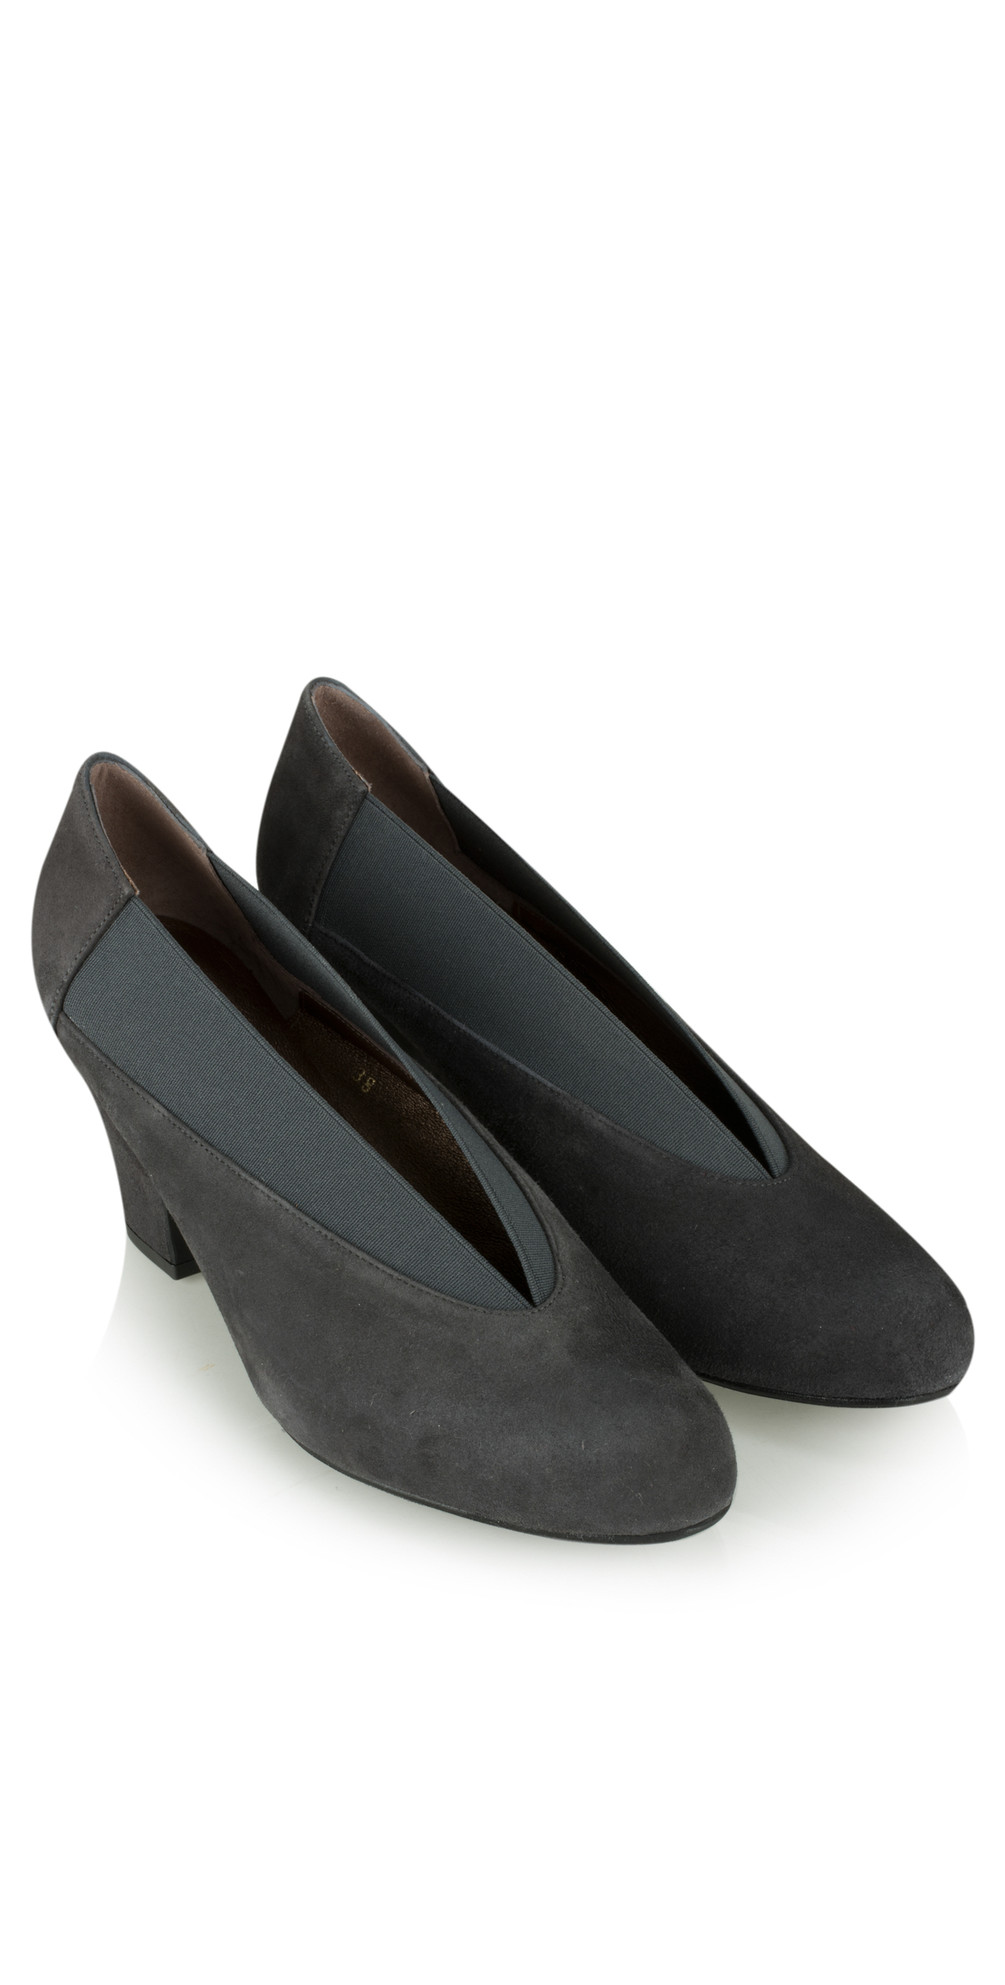 Brumabe Anthracite Suede Shoe main image